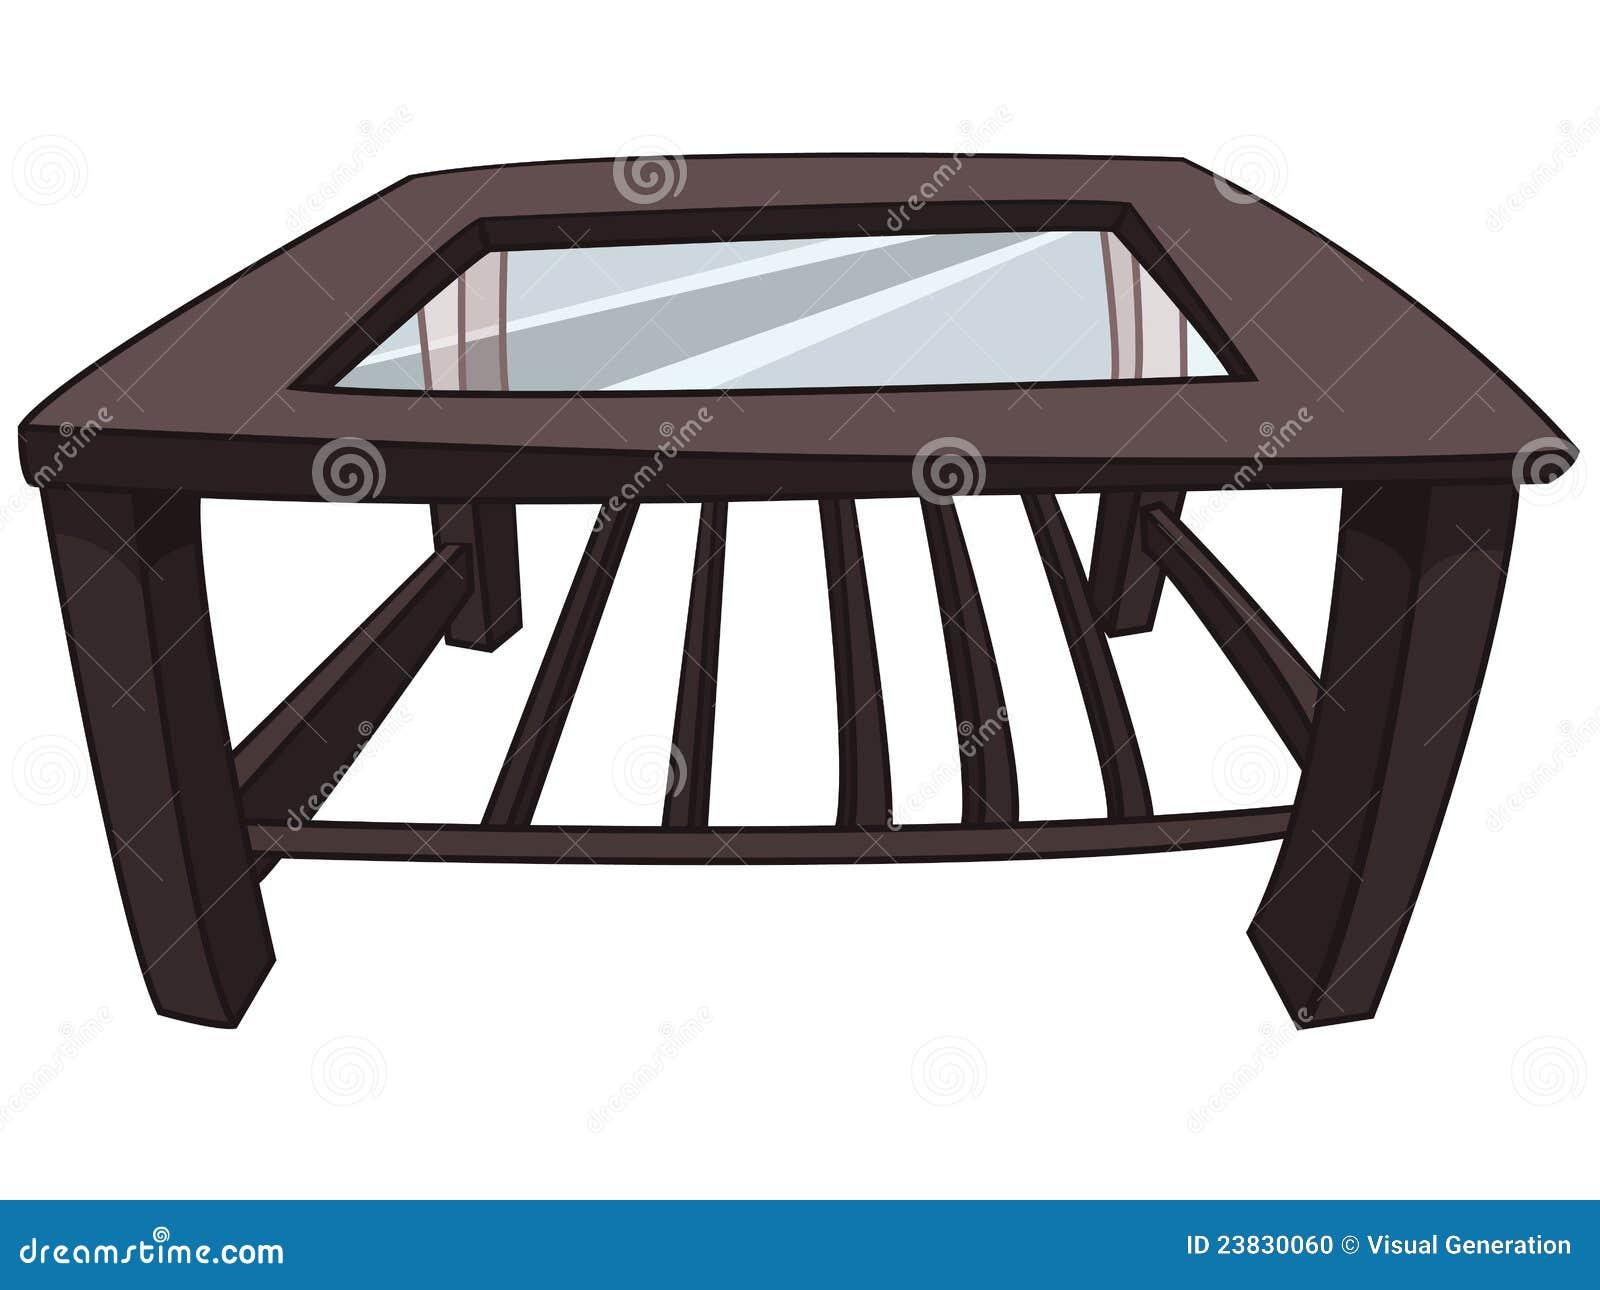 Cartoon Home Furniture Table Stock Photo Image 23830060